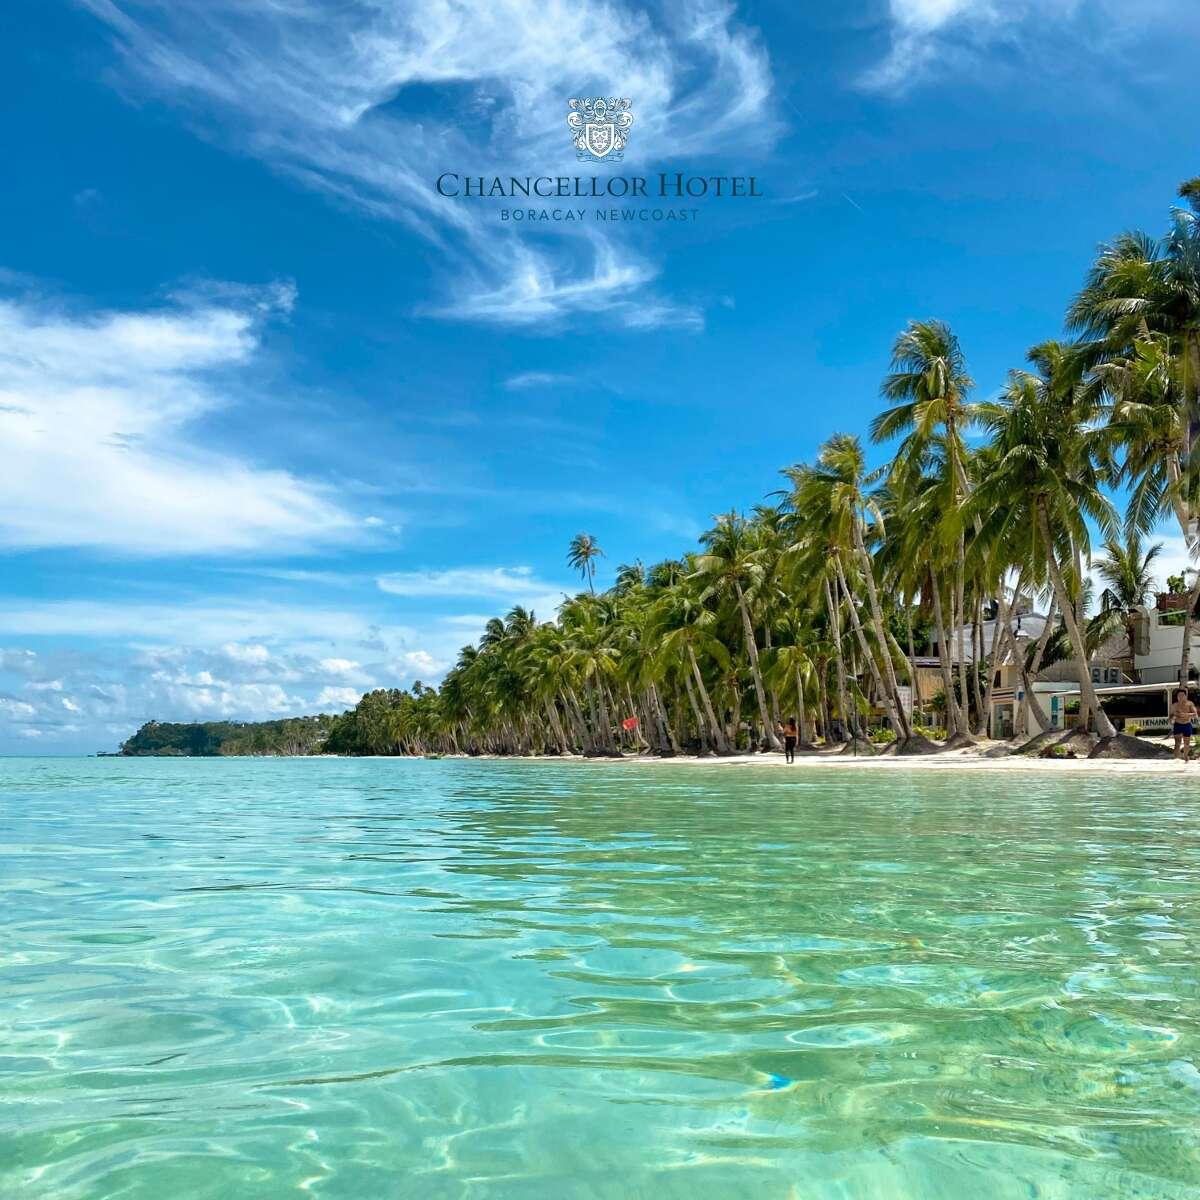 Chancellor Hotel Boracay Philippines